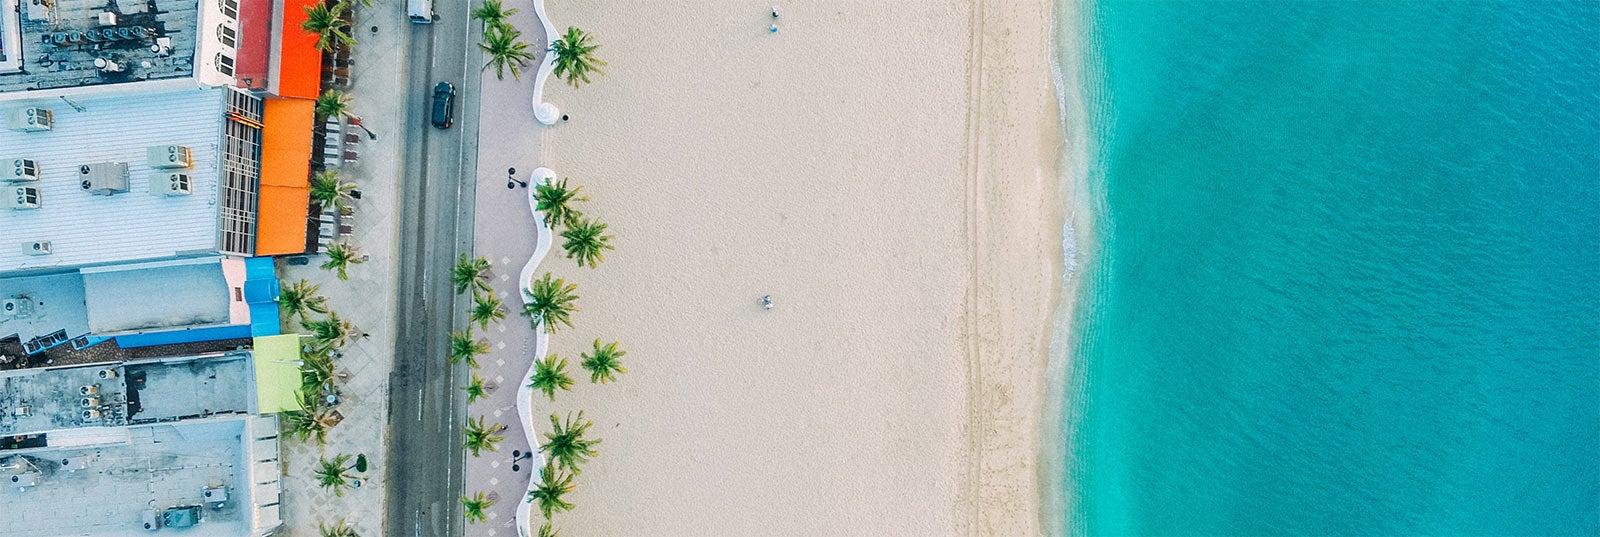 Guía turística de Miami